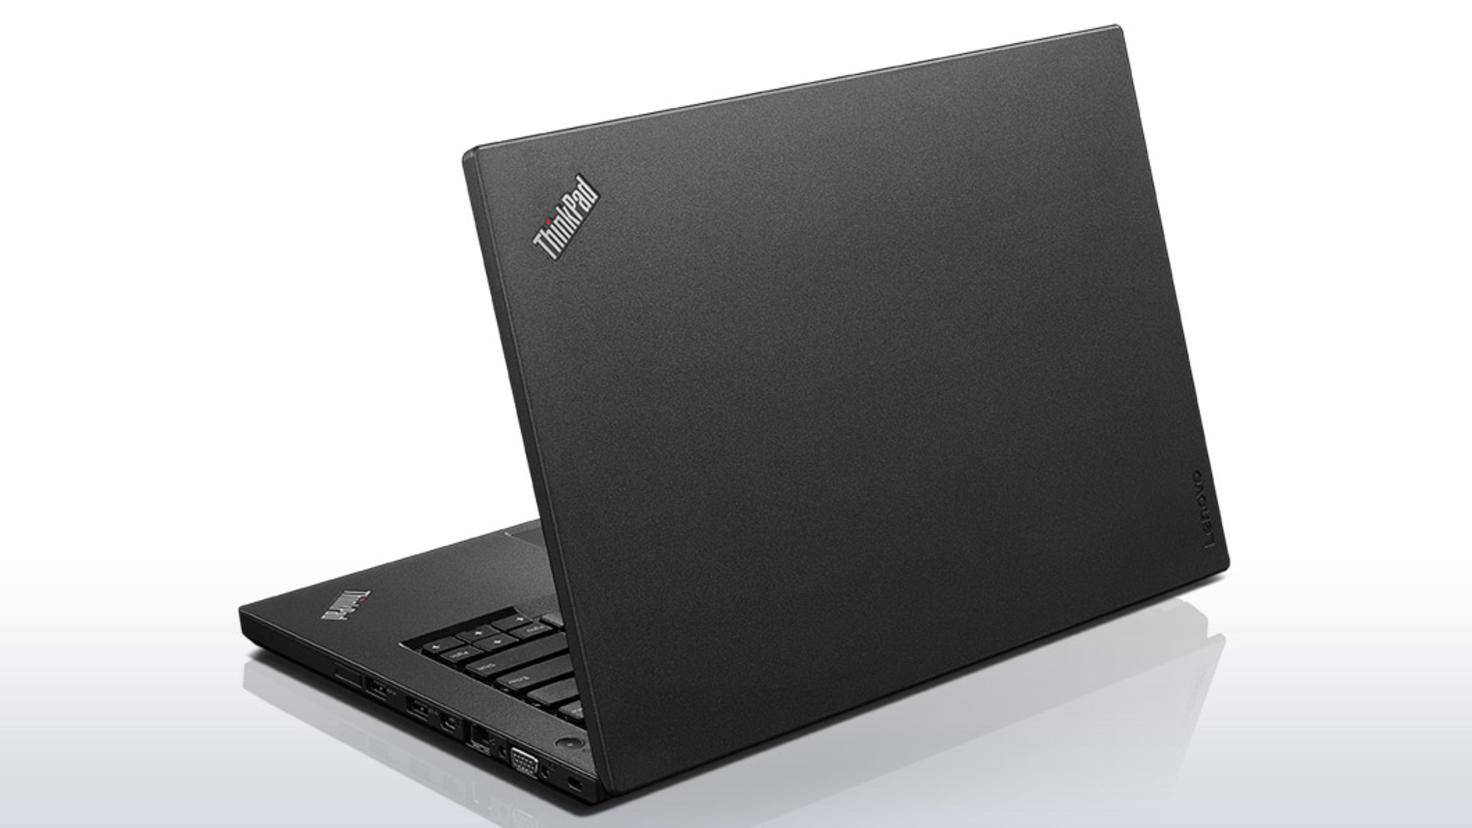 lenovo-laptop-thinkpad-l460-cover-1